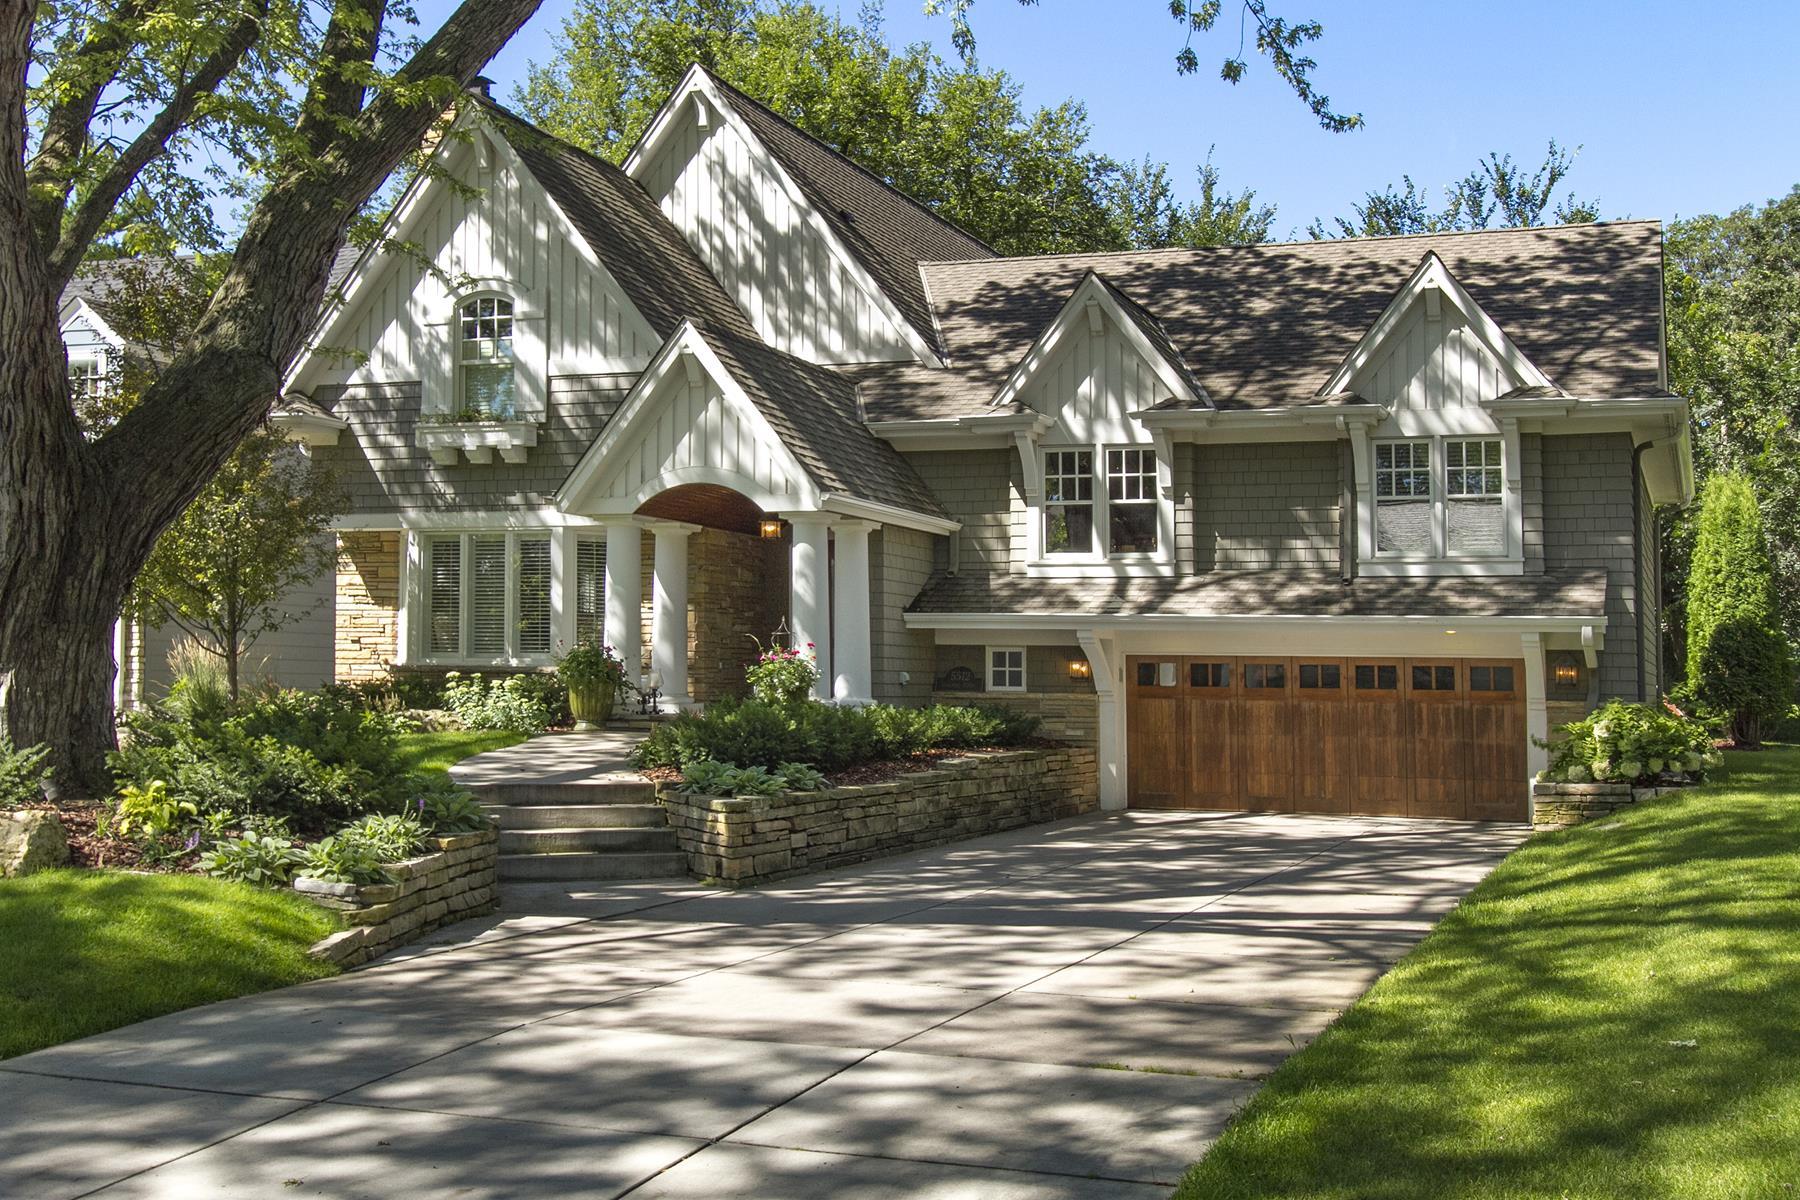 Single Family Home for Sale at 5512 Oaklawn Avenue Edina, Minnesota, 55424 United States